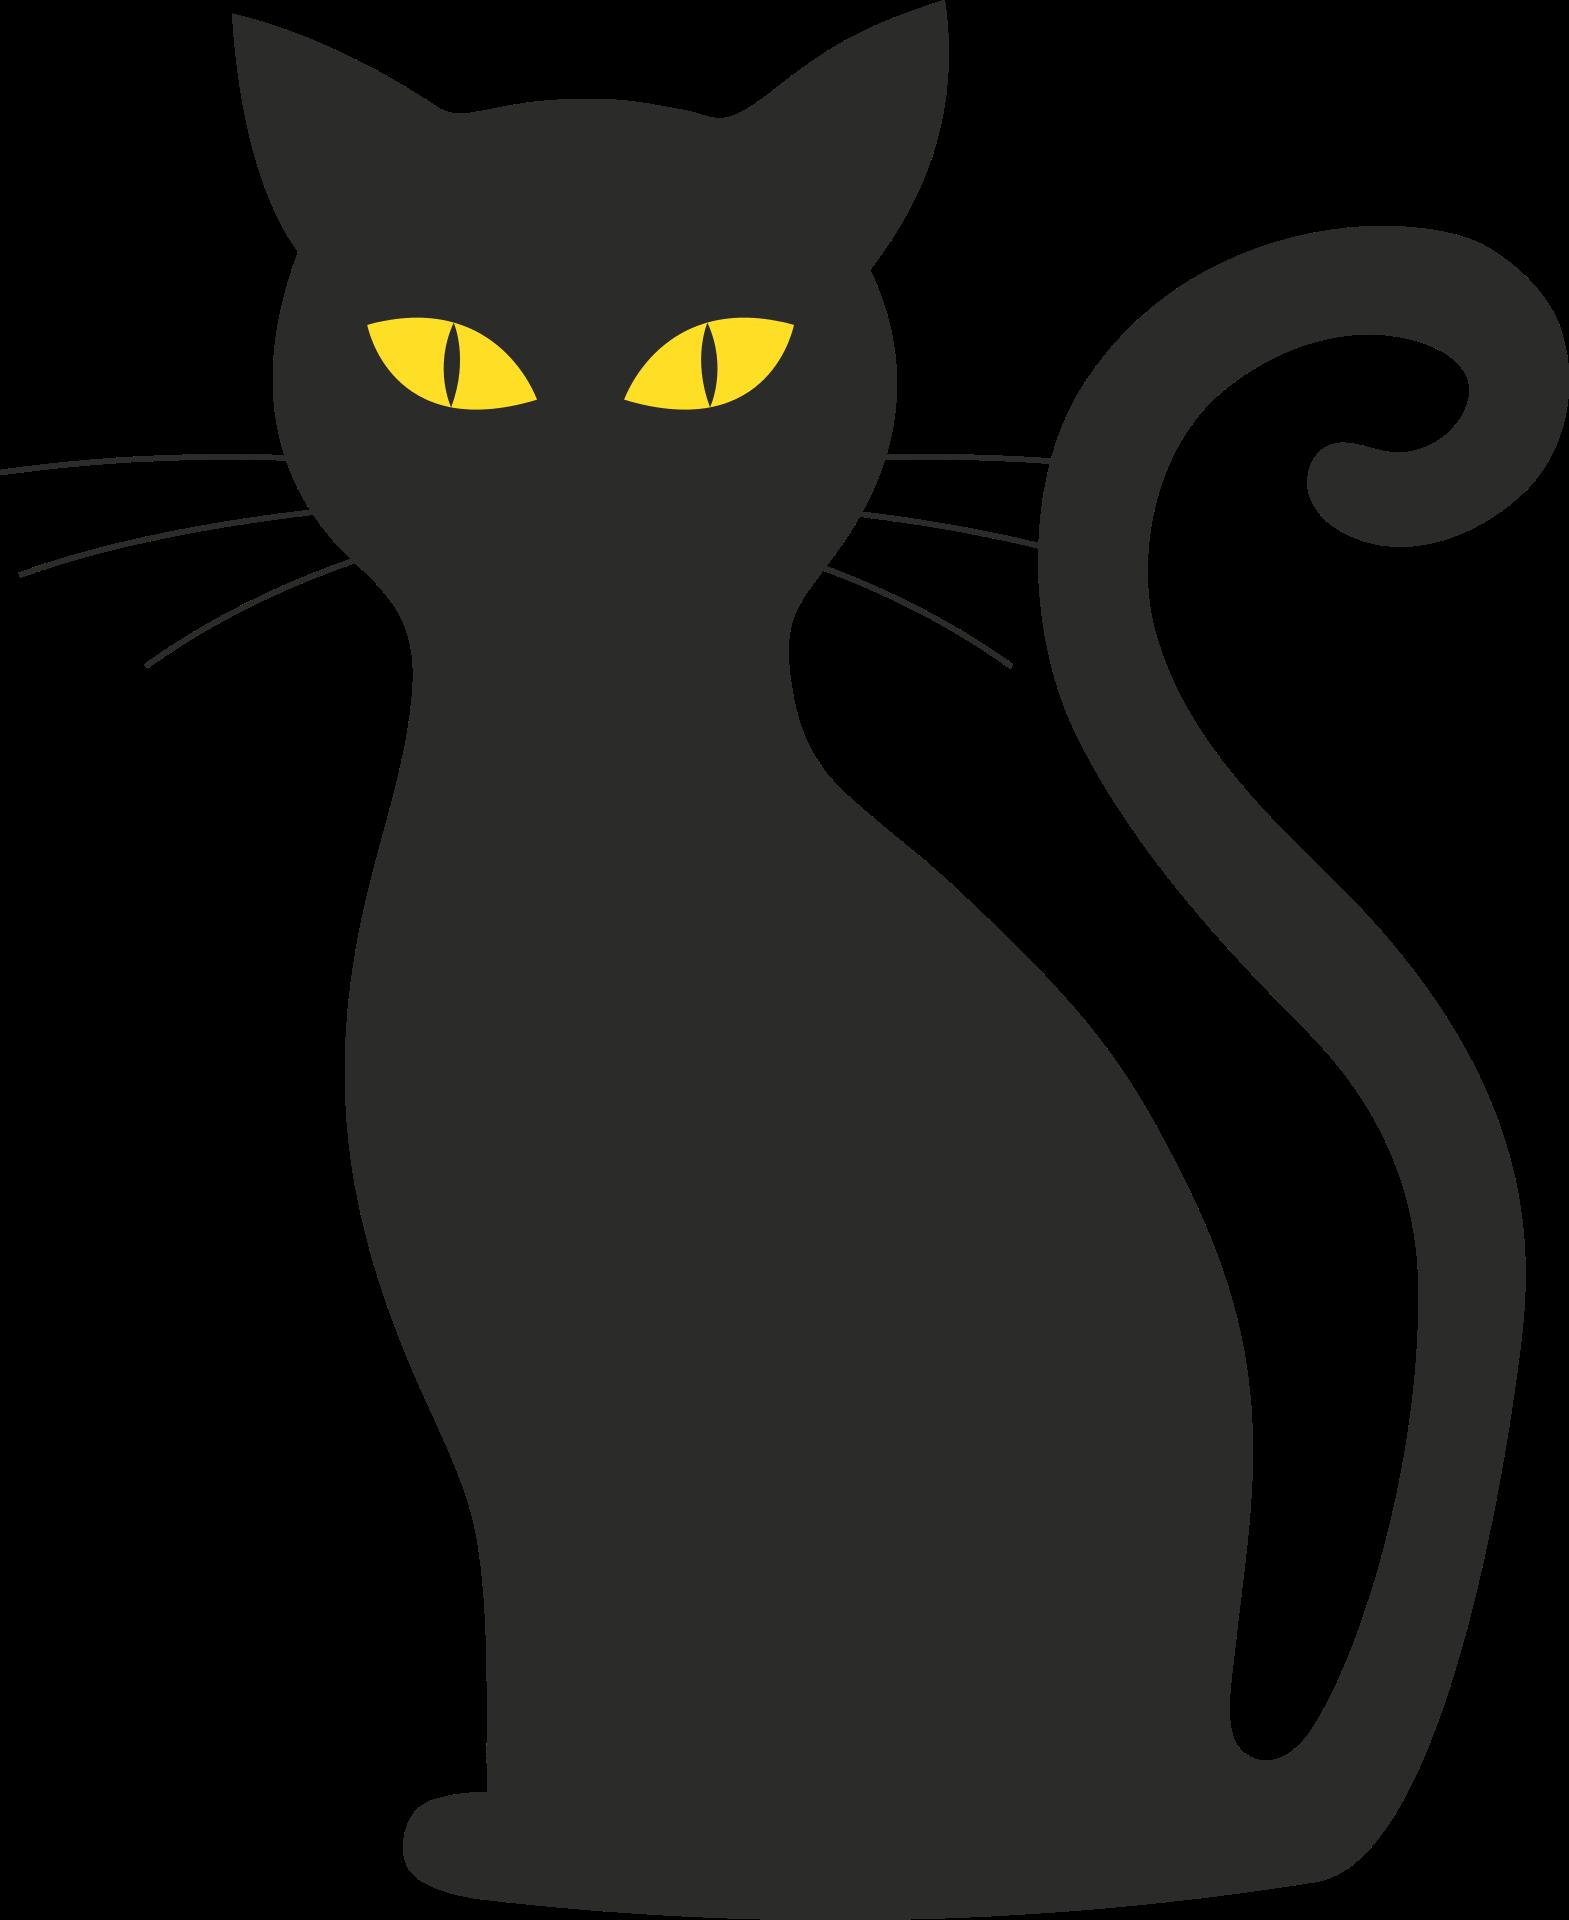 Szablon kota png czarny. Finger clipart mid